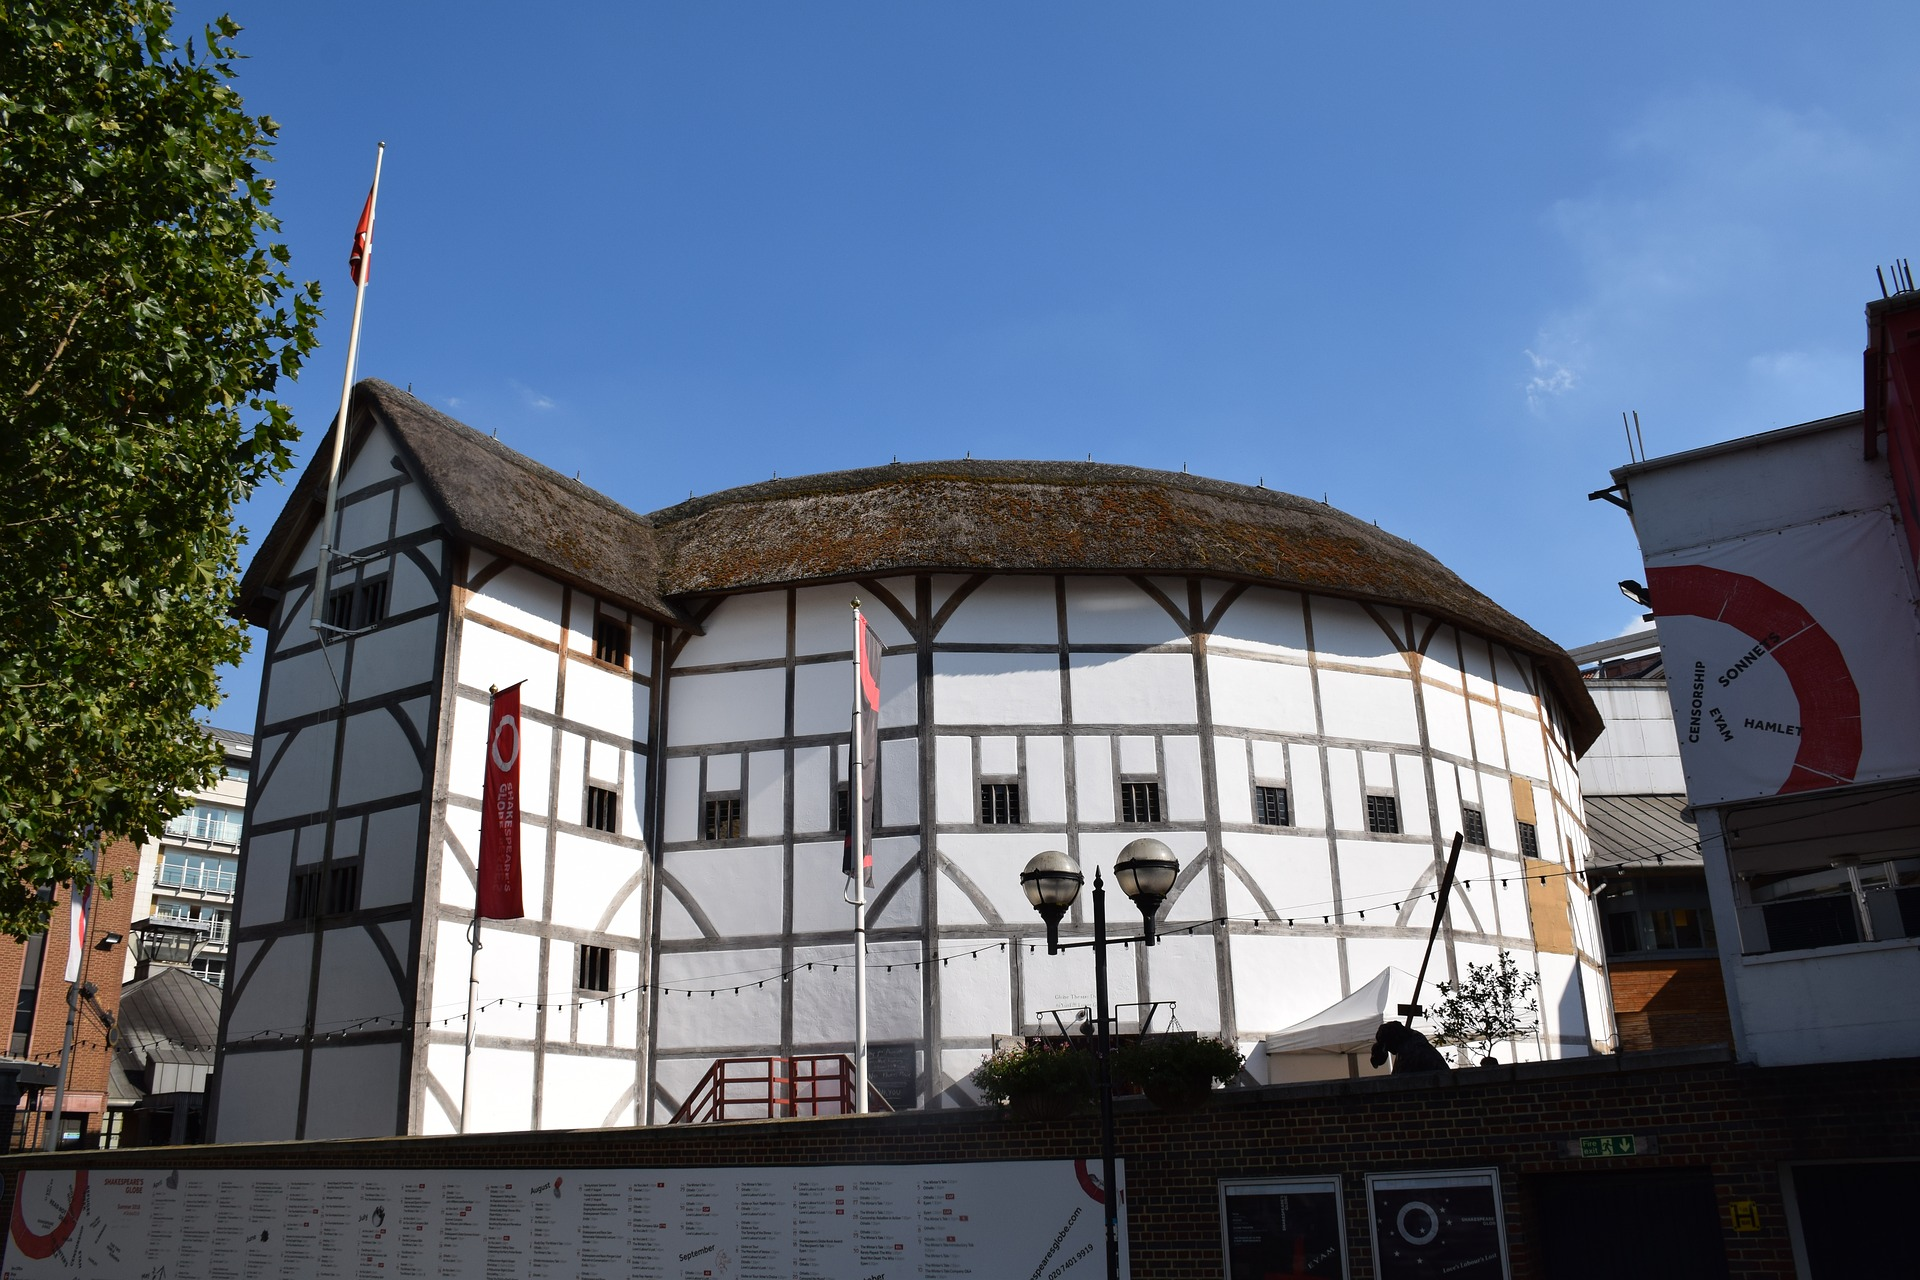 photo of Globe Theatre in London